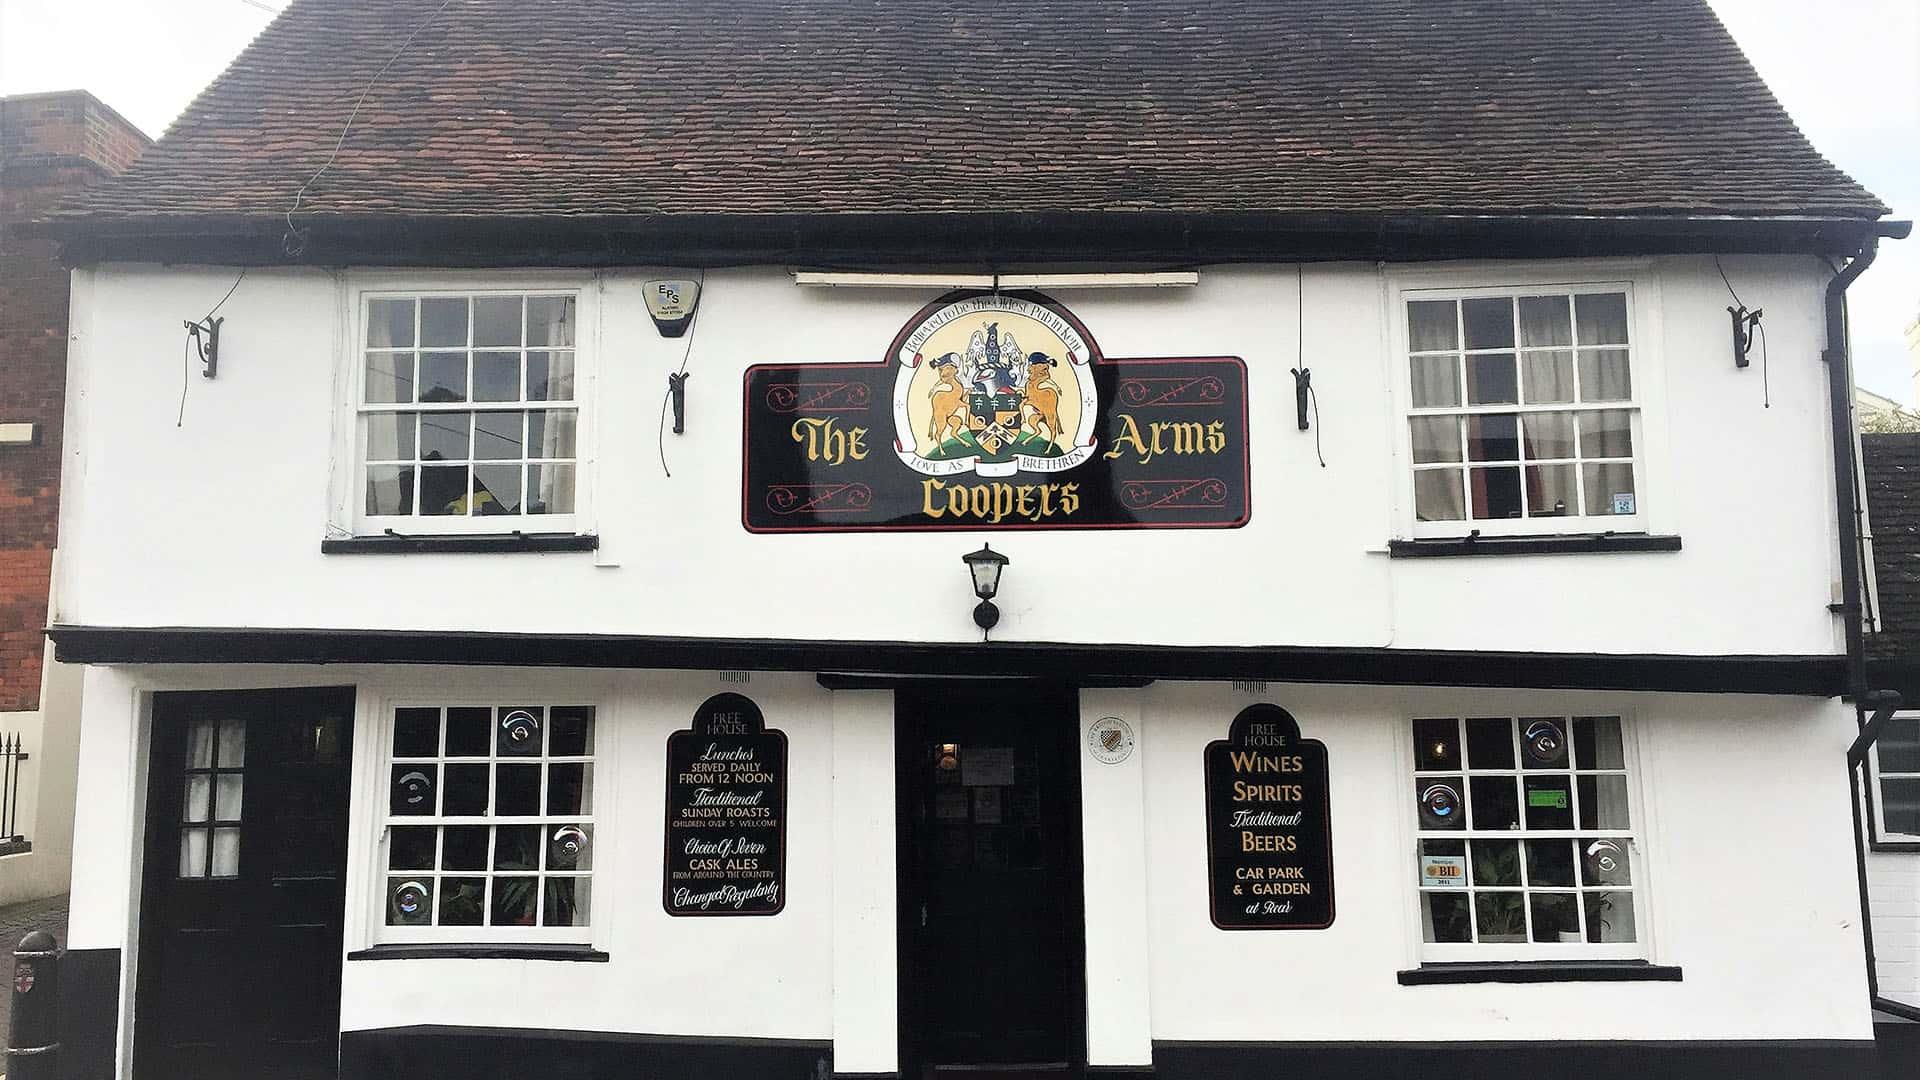 The Cooper's Arms near Rochester Castle